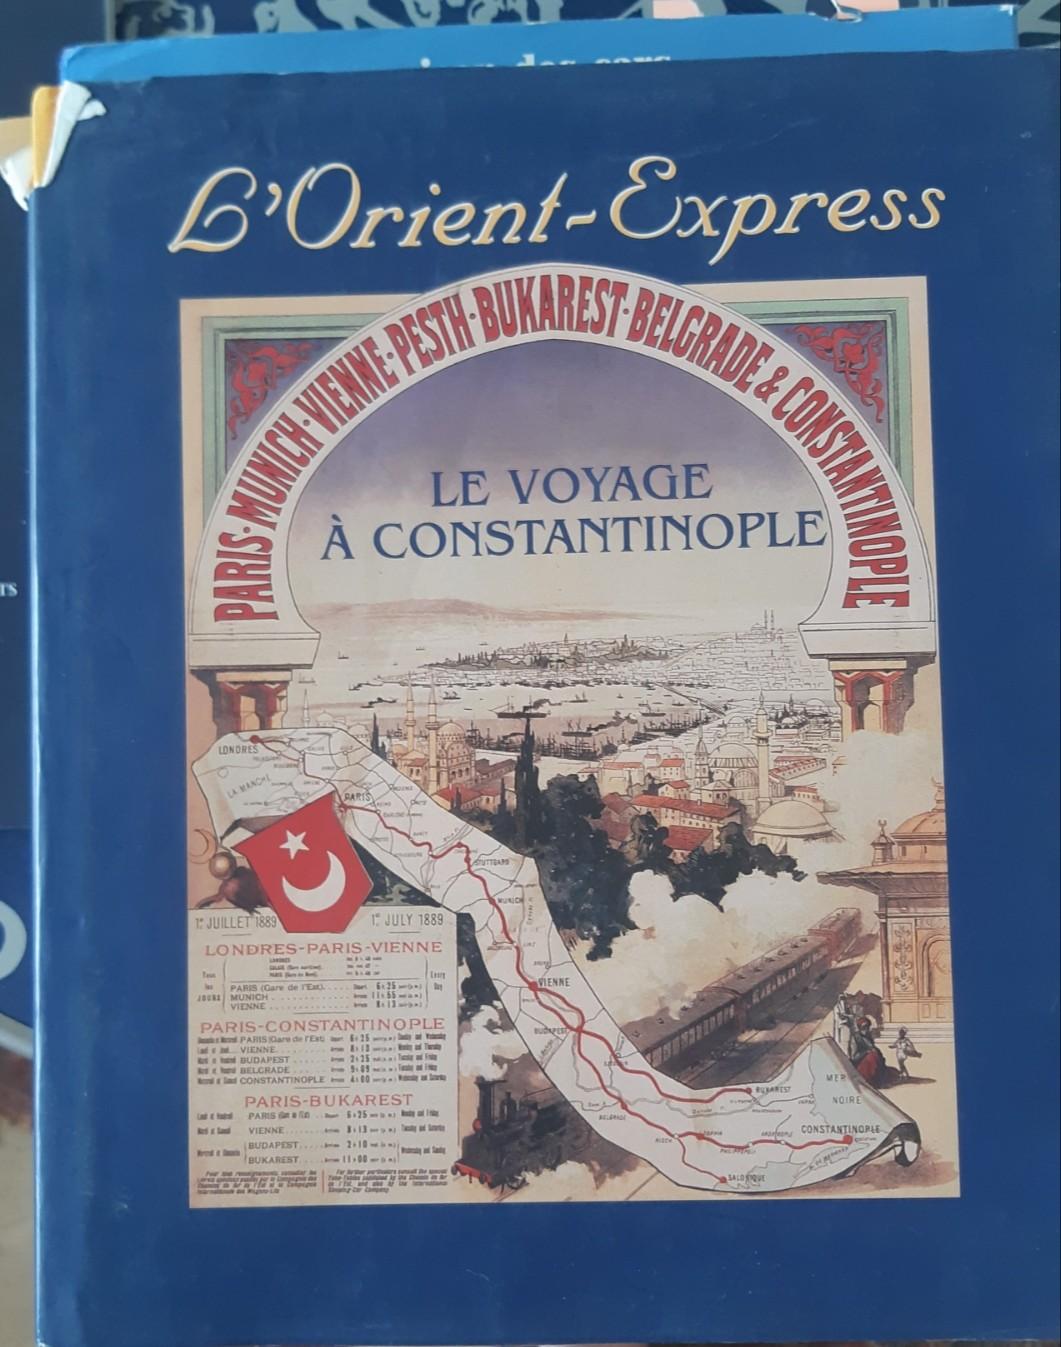 Edition catalogue expo bruxelles bel